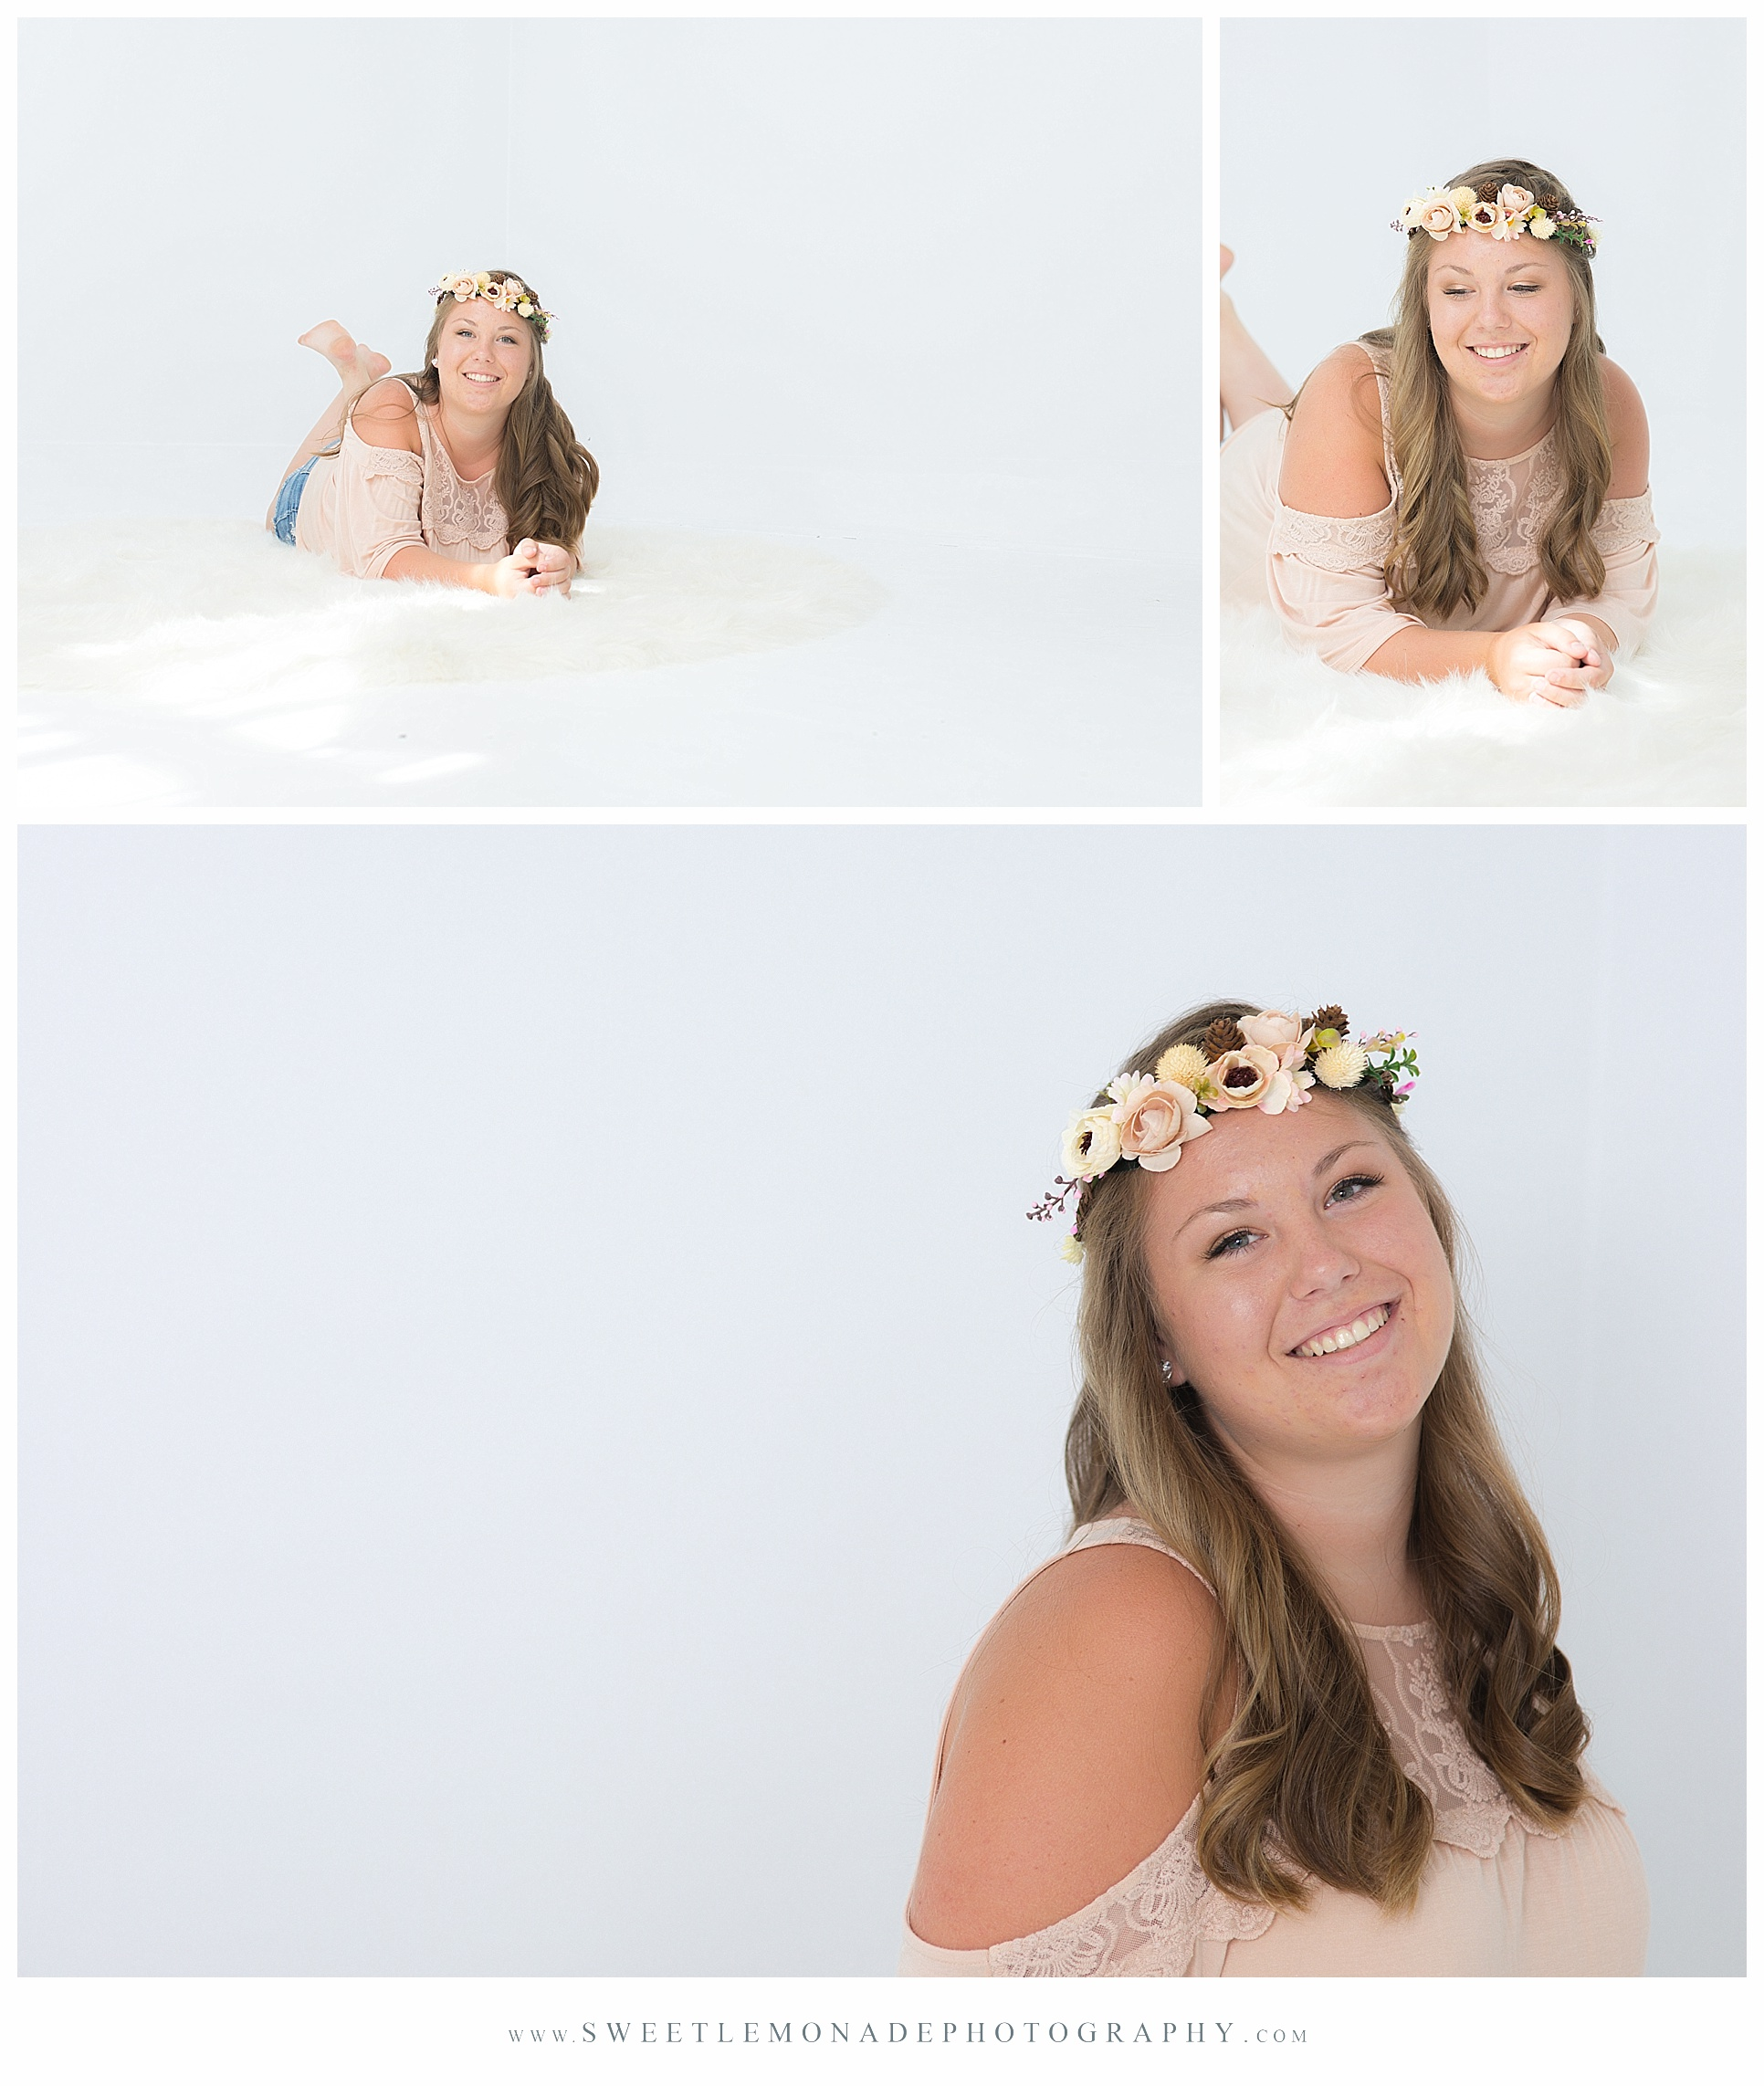 champaign-senior-photographer-sweet-lemonade-photography-floral-crown-tween-pictures_2251.jpg